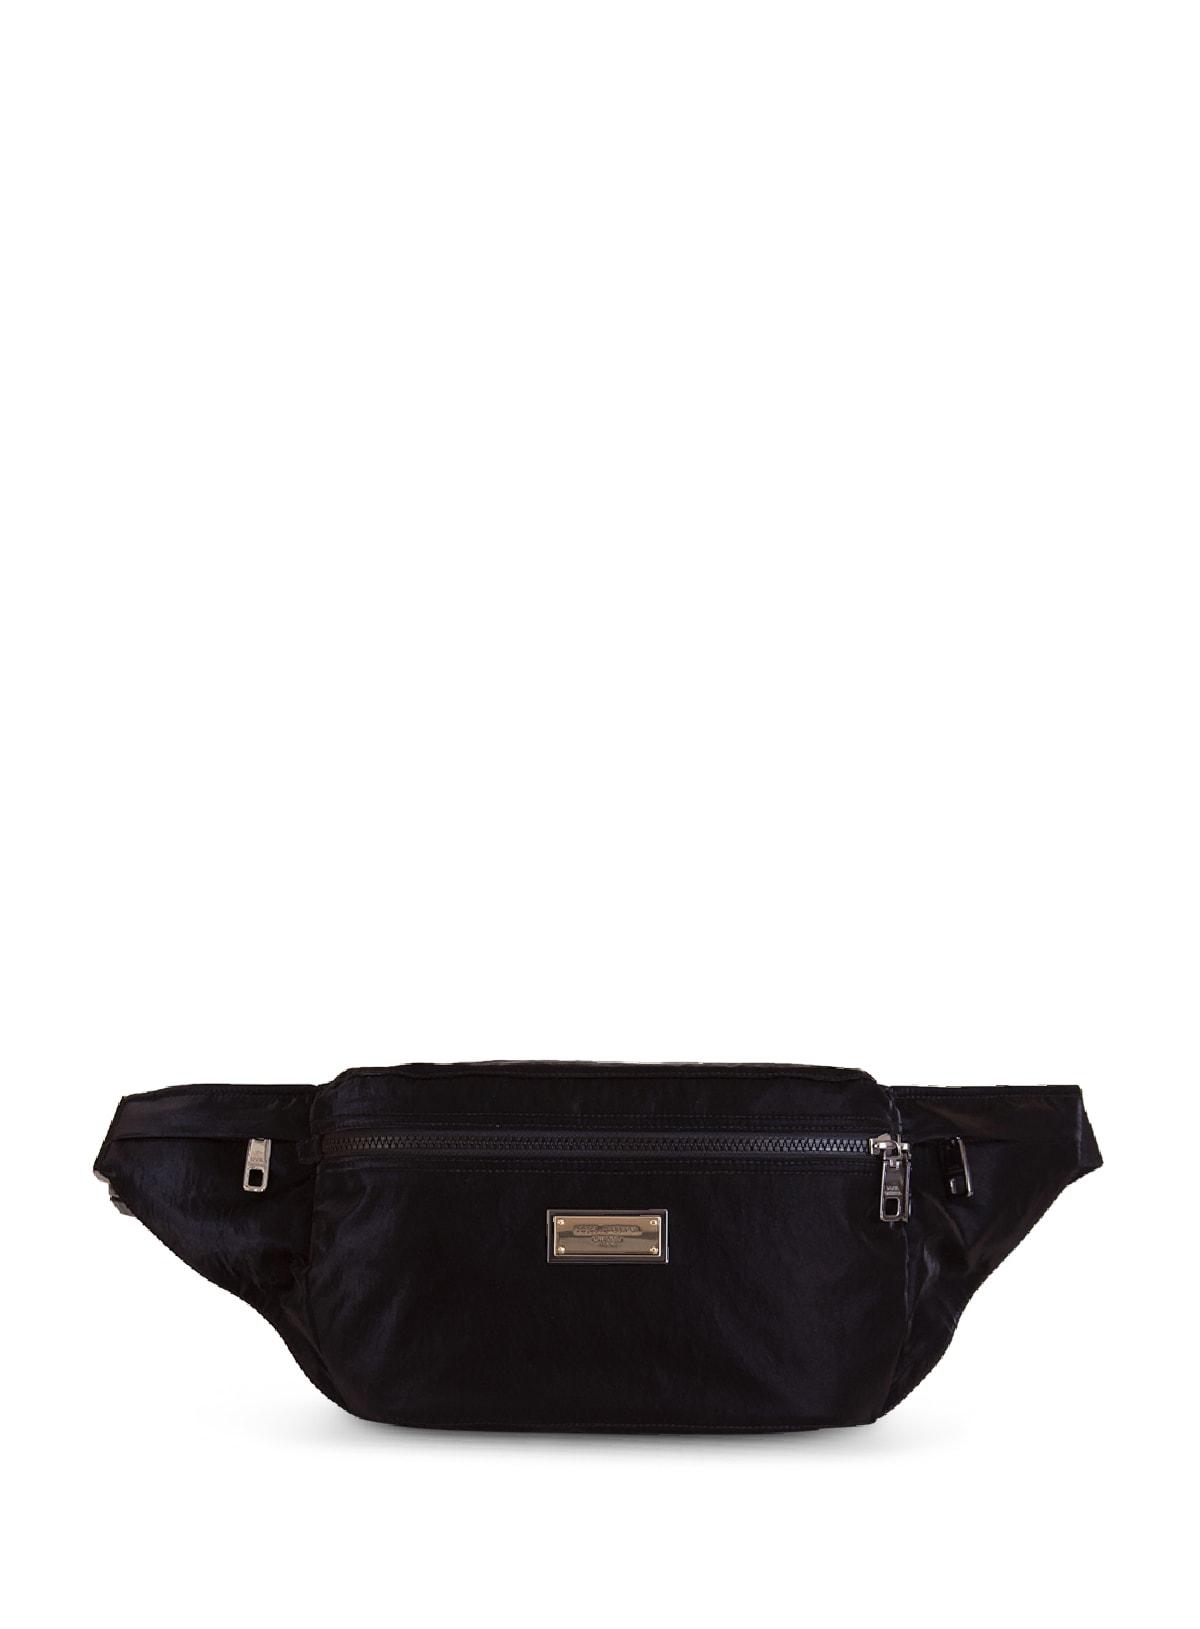 Dolce & Gabbana LOGO-PLAQUE BELT BAG